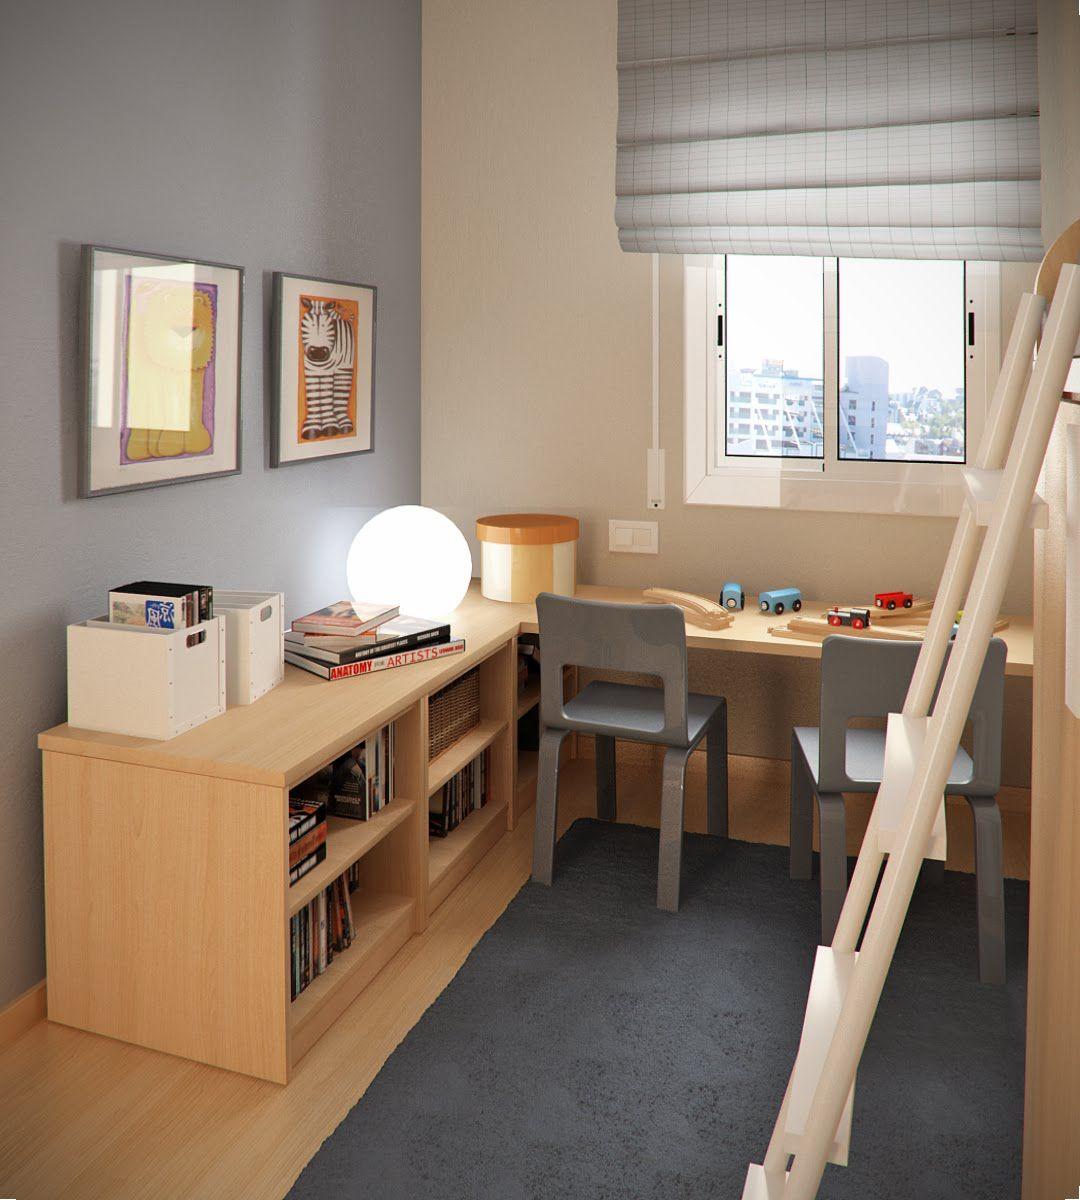 Double loft bed with desk  Double Loft Beds in Teen Small Bedroom Design Ideas By Sergi Mengot